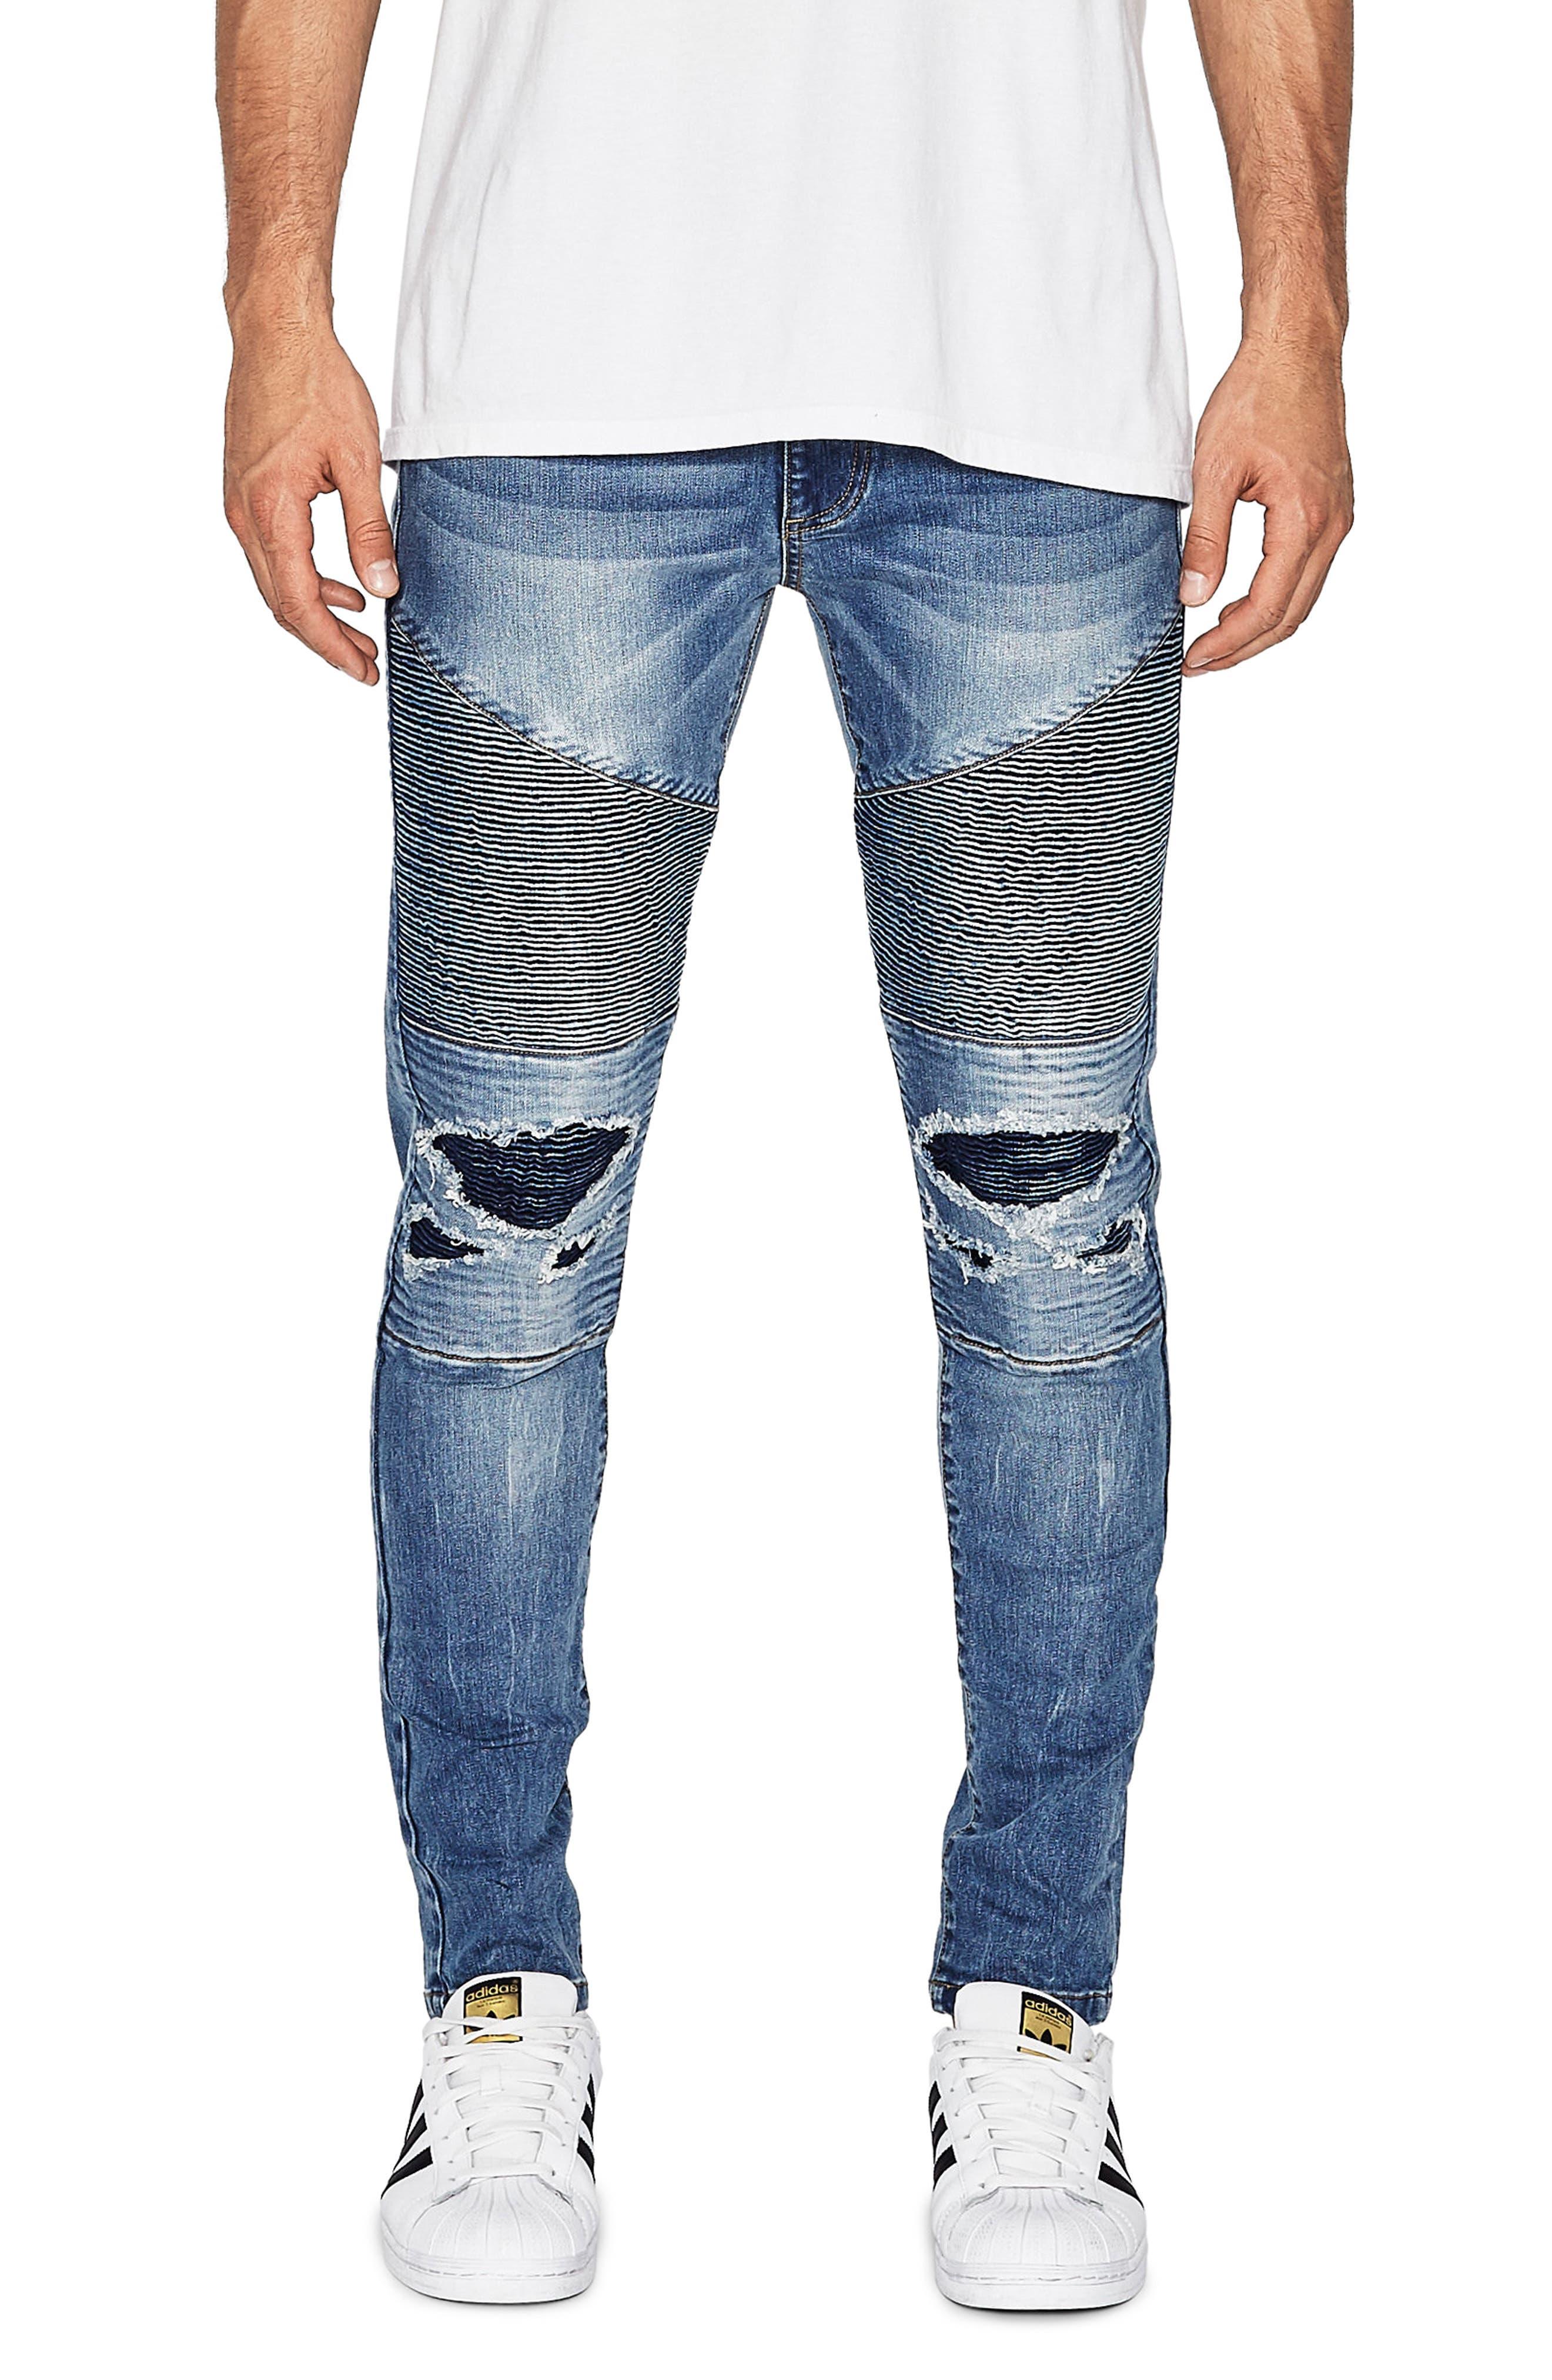 NXP Combination Moto Skinny Moto Jeans (Milwaukee Blue)